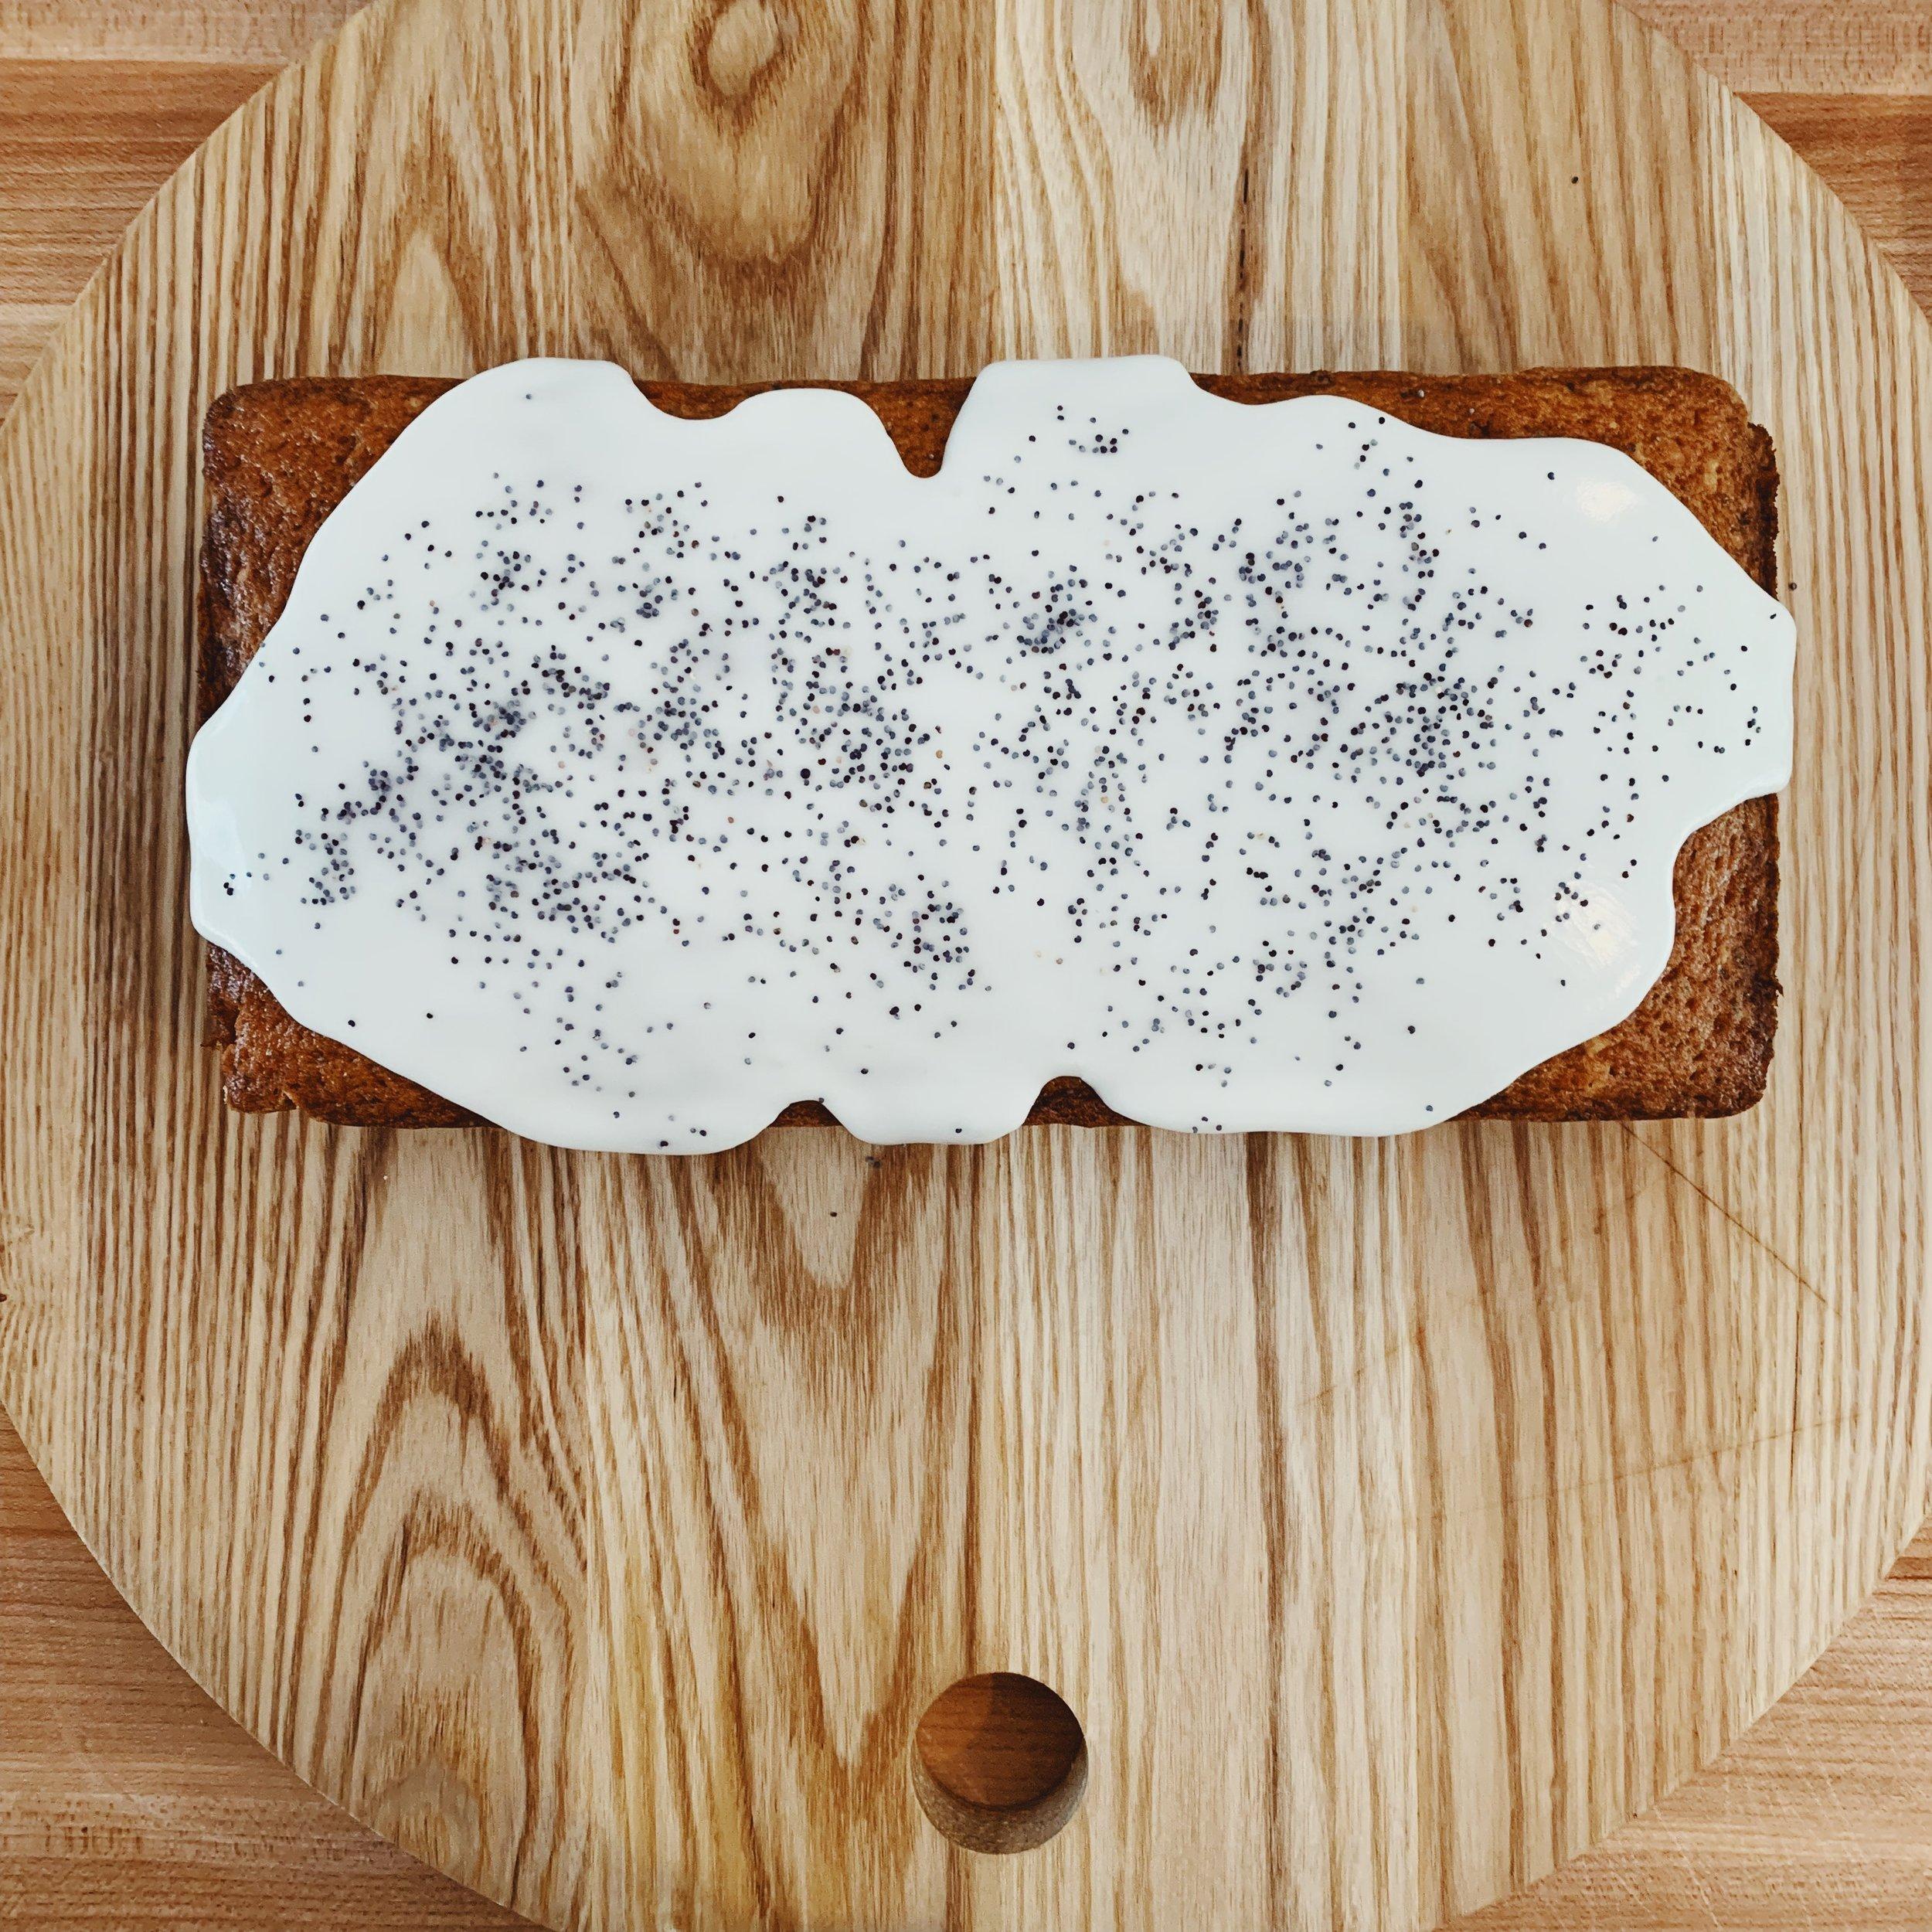 Lemon Poppyseed Loaf